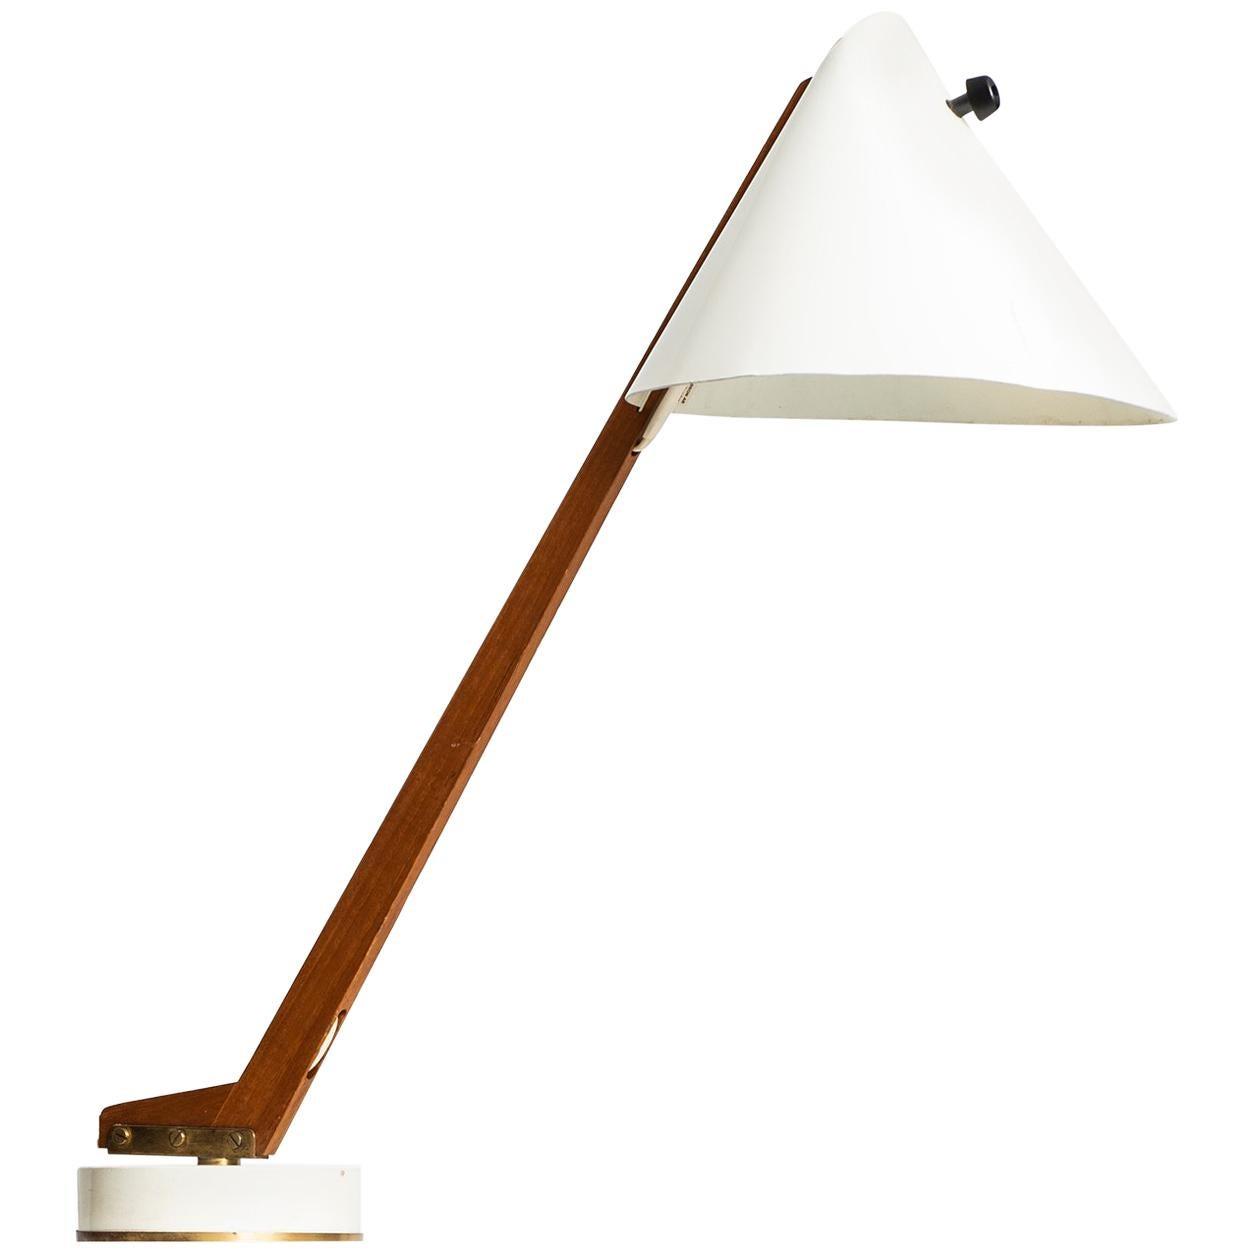 Hans-Agne Jakobsson Table Lamp Model B-54 by Hans-Agne Jakobsson AB in Sweden